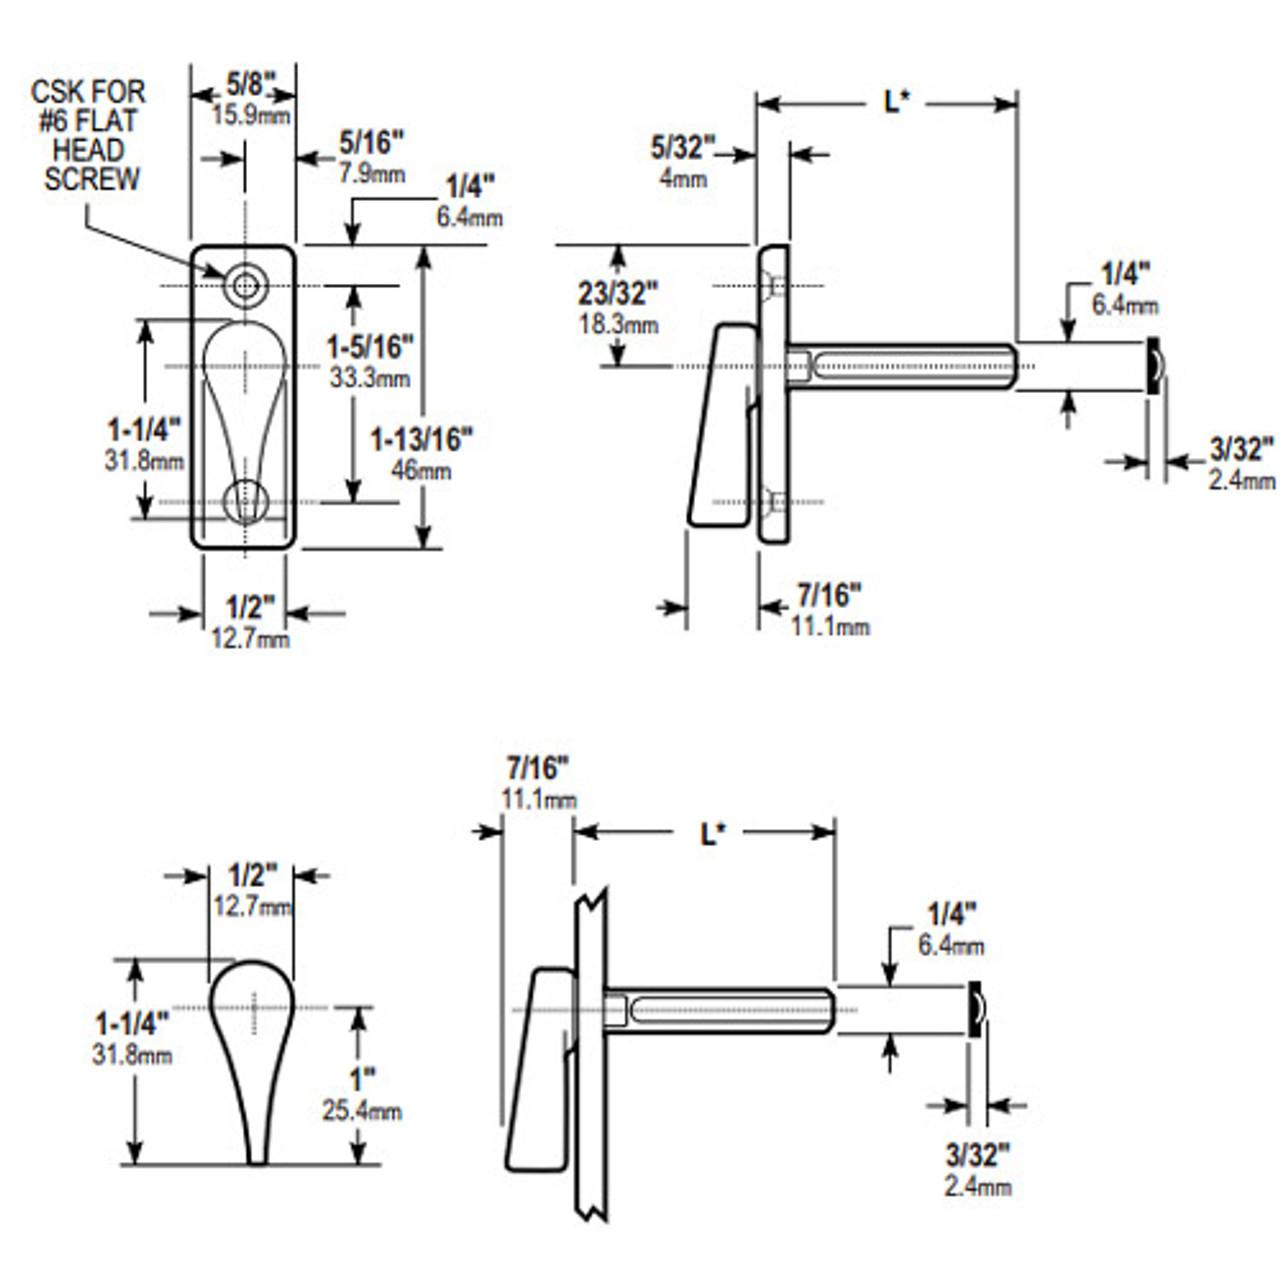 1000-21-17-121 Adams Rite 1000 Series Turns Dimensional View